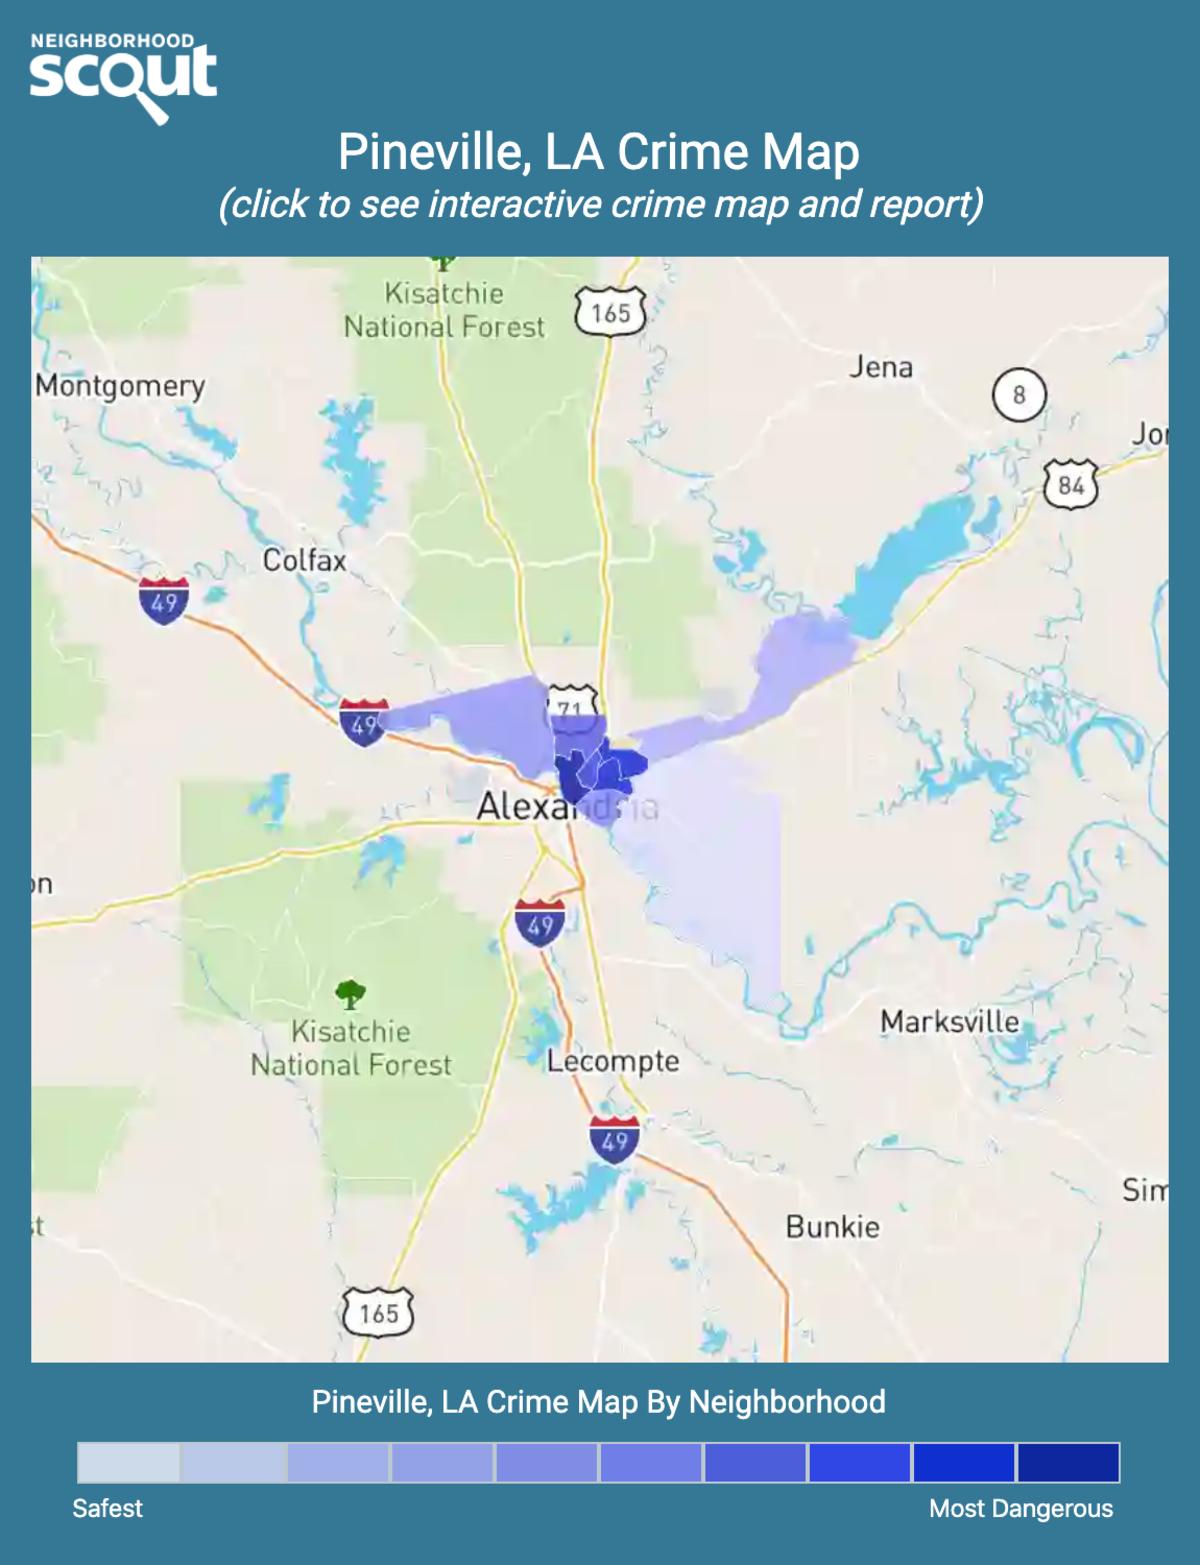 Pineville, Louisiana crime map